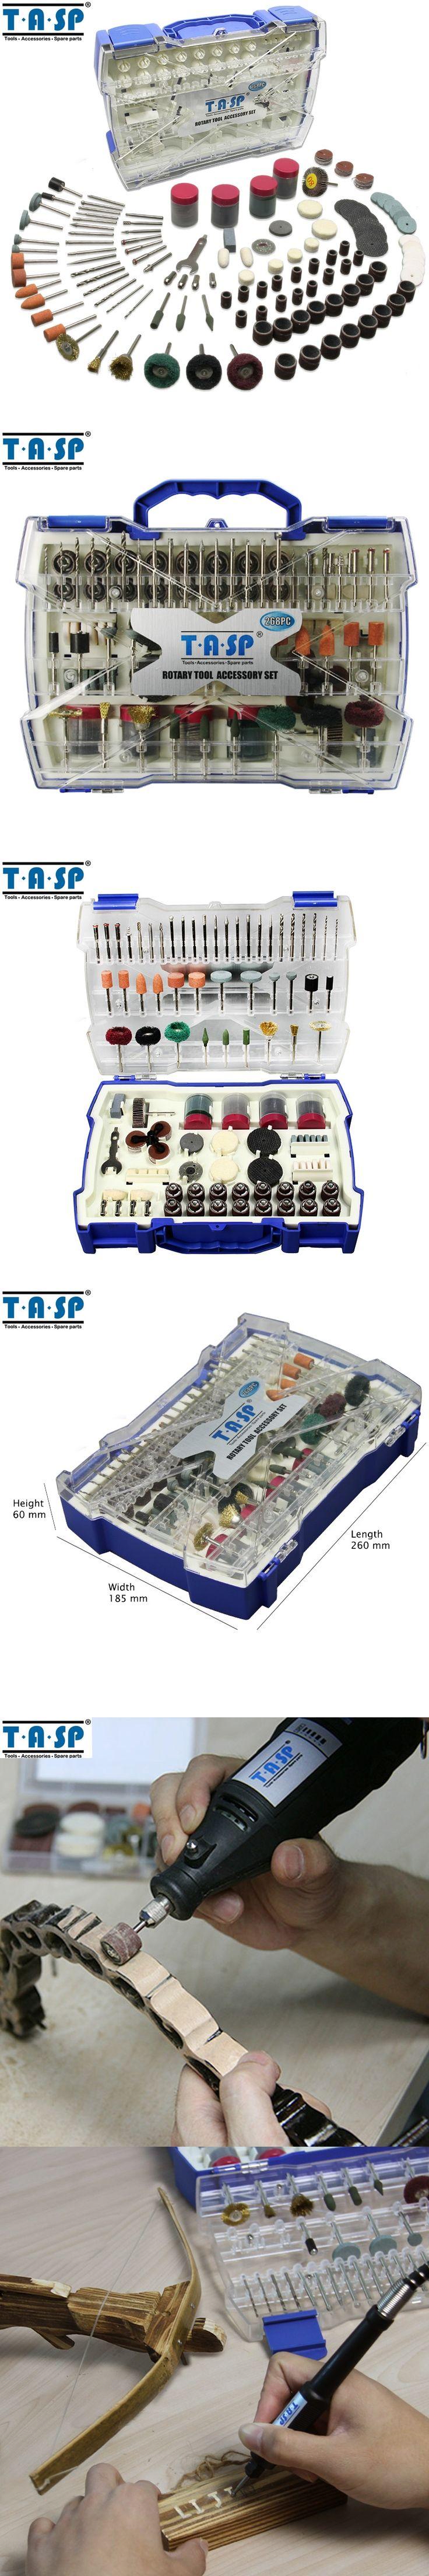 TASP 268PC Dremel Mini Drill Rotary Tool Accessories Bit Set for Grinding Polishing Cutting Abrasive Tools Kits